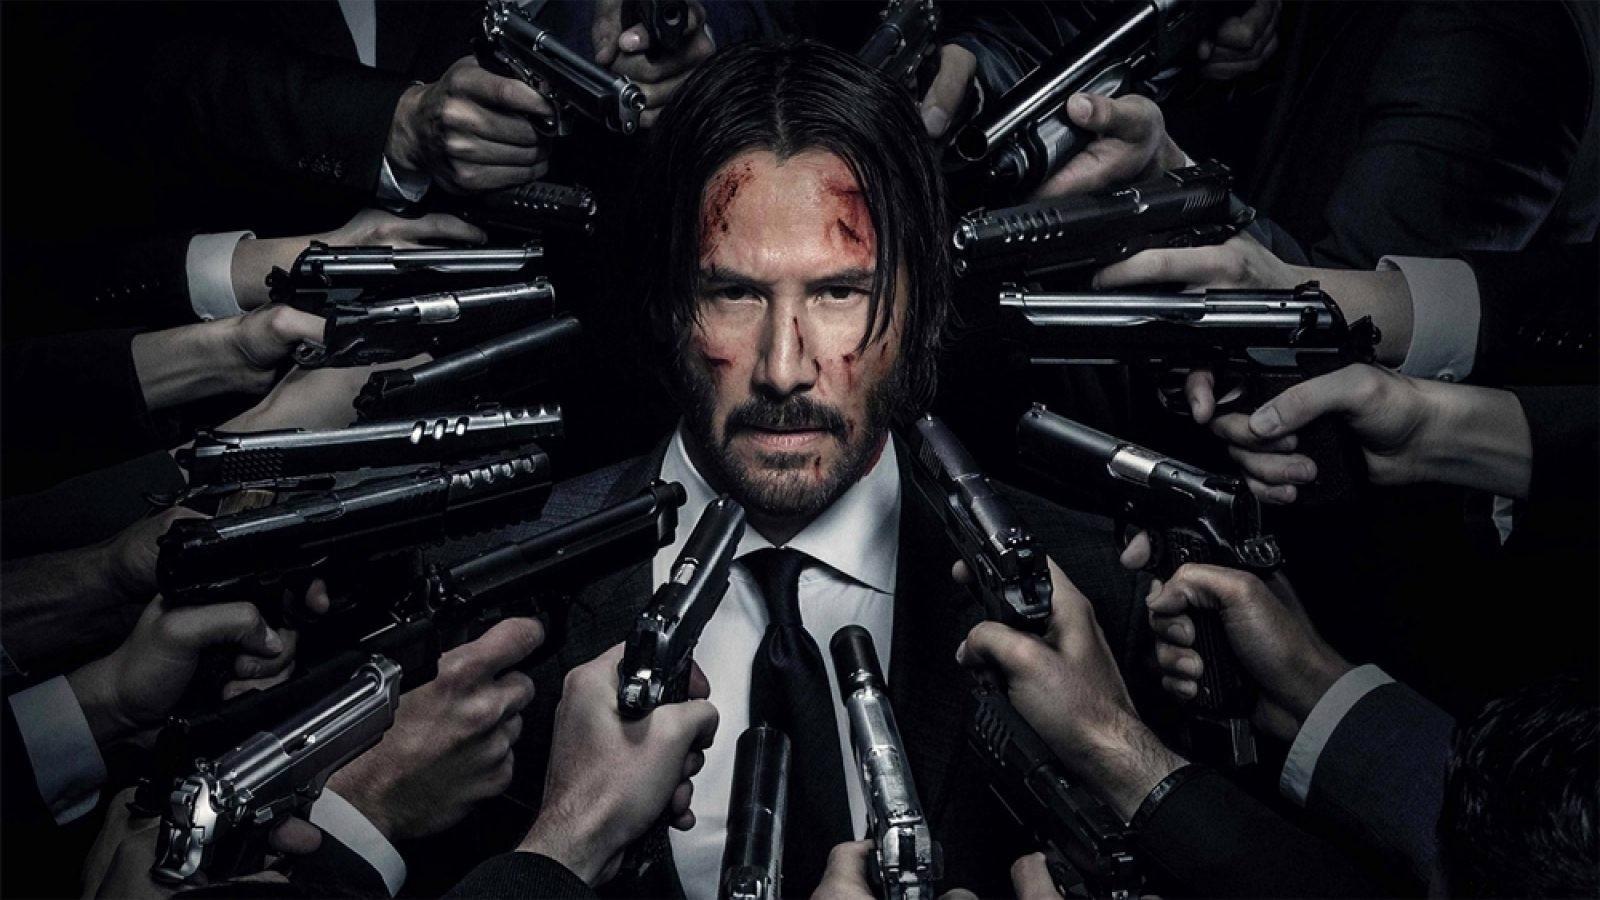 """John Wick 4"" Confirmed, Release Date Announced"